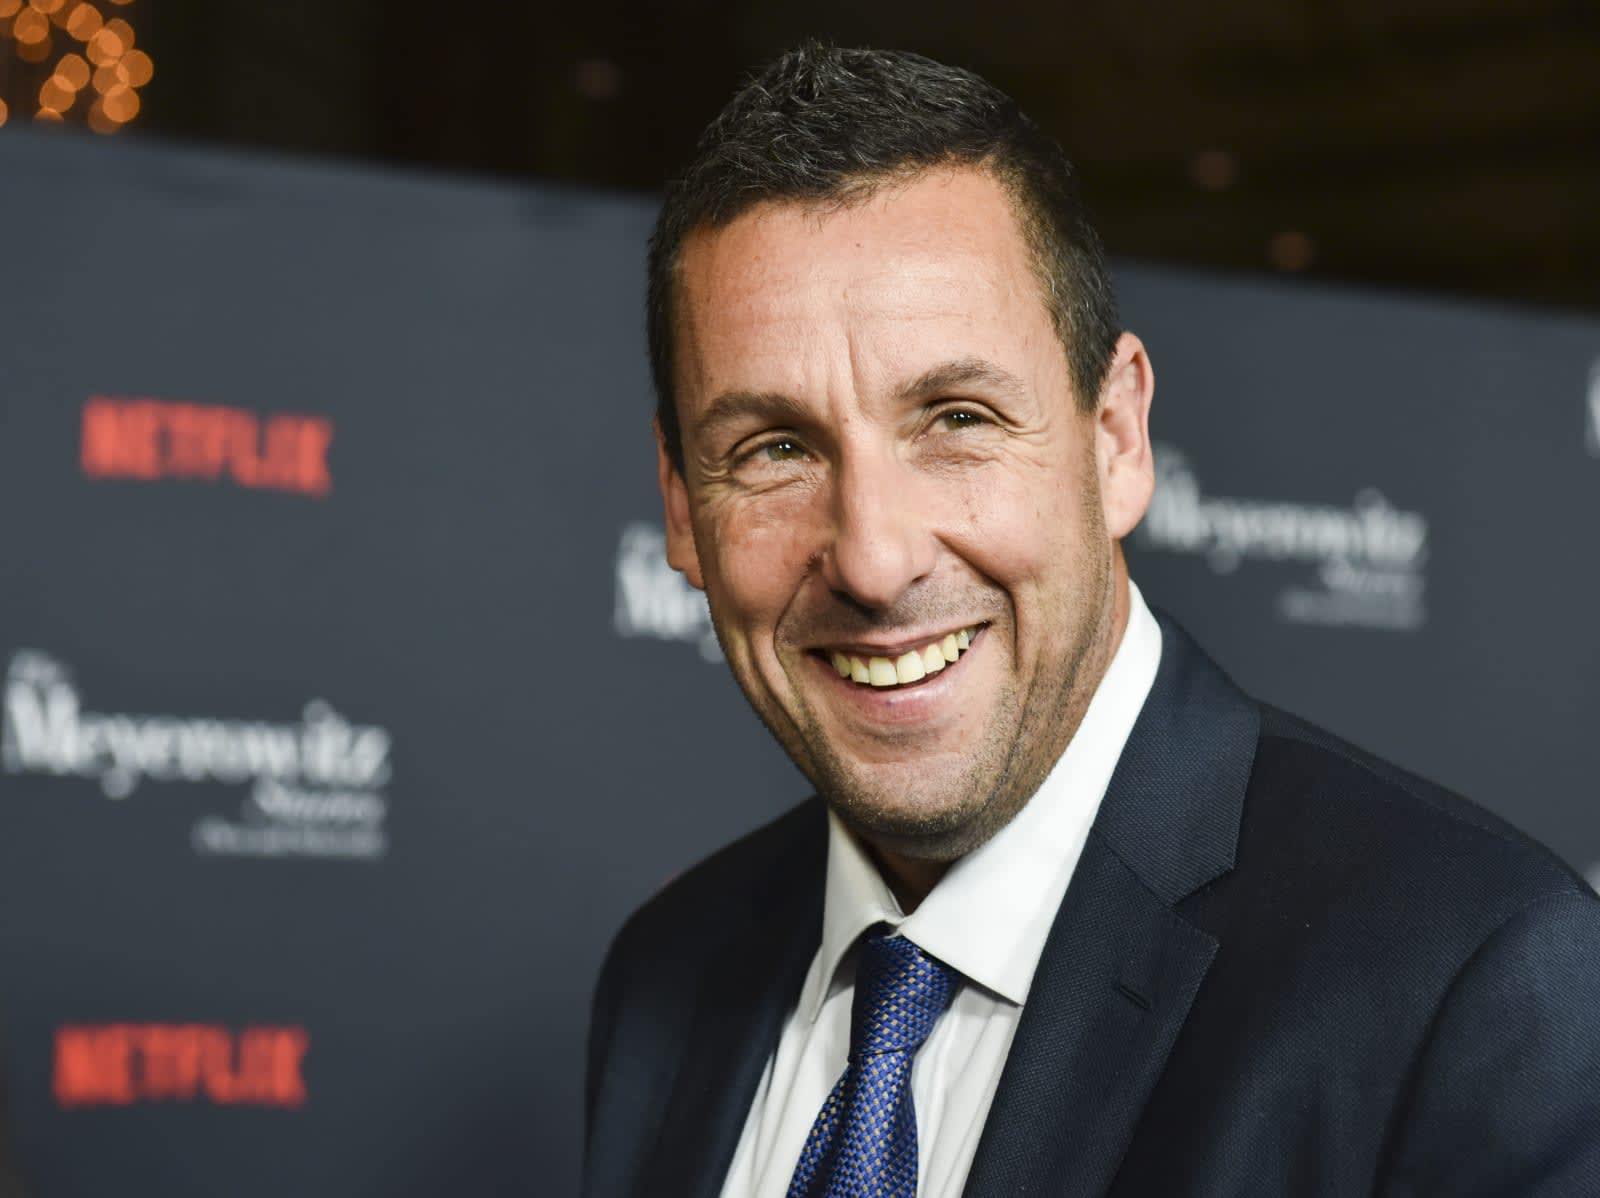 Adam Sandler's latest Netflix film sports a star-studded cast